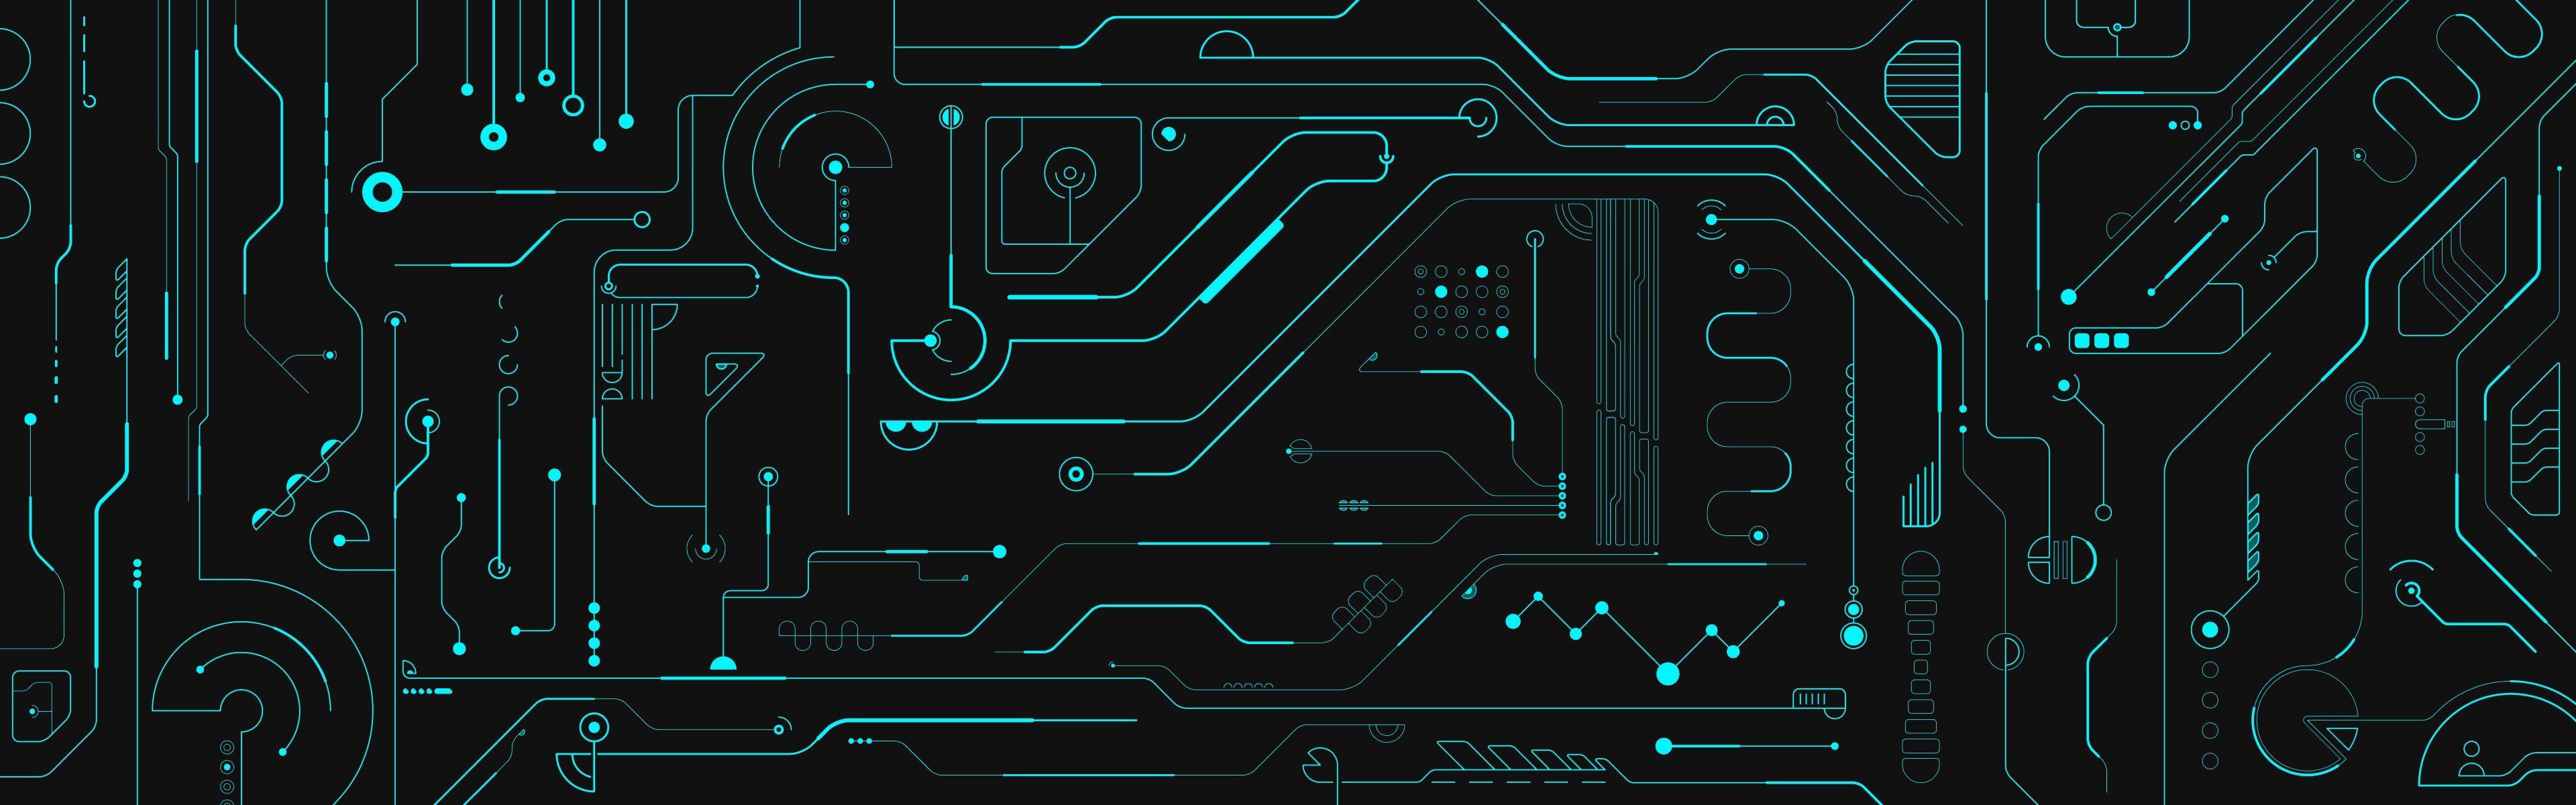 Electronics Wallpapers On Wallpaperdog